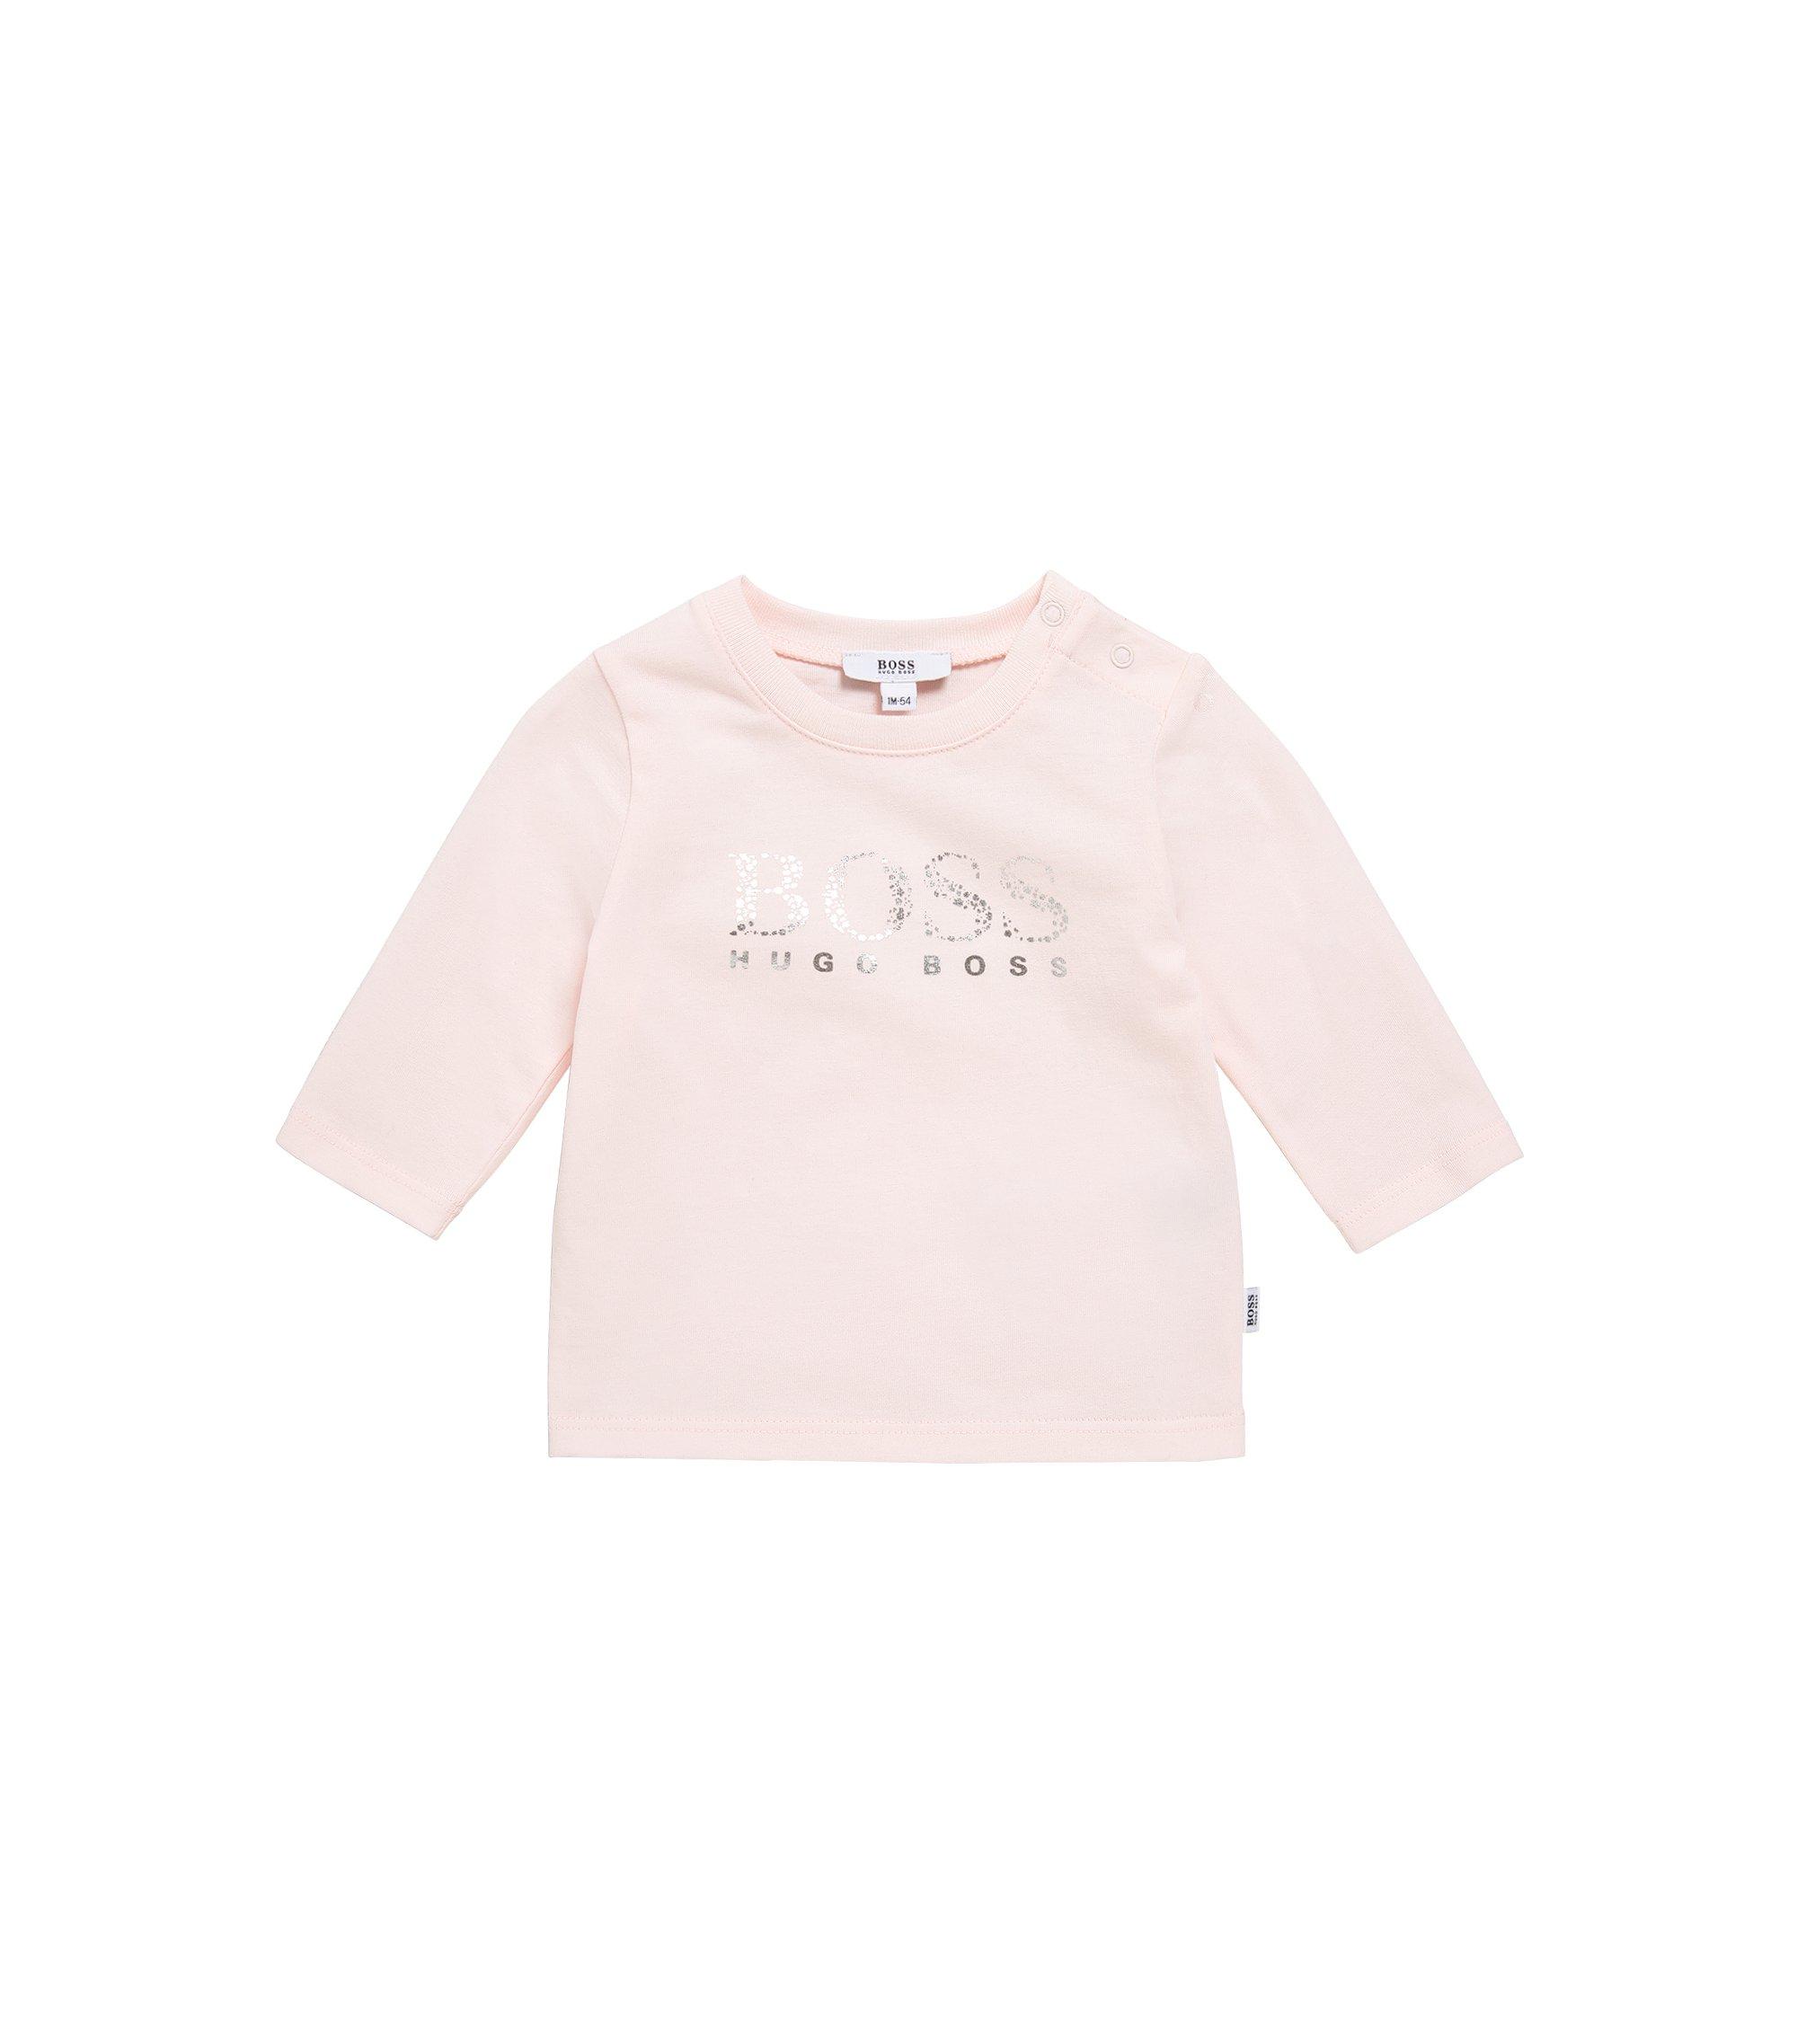 Baby-Longsleeve aus elastischer Baumwolle mit Metallic-Print: 'J95203', Hellrosa